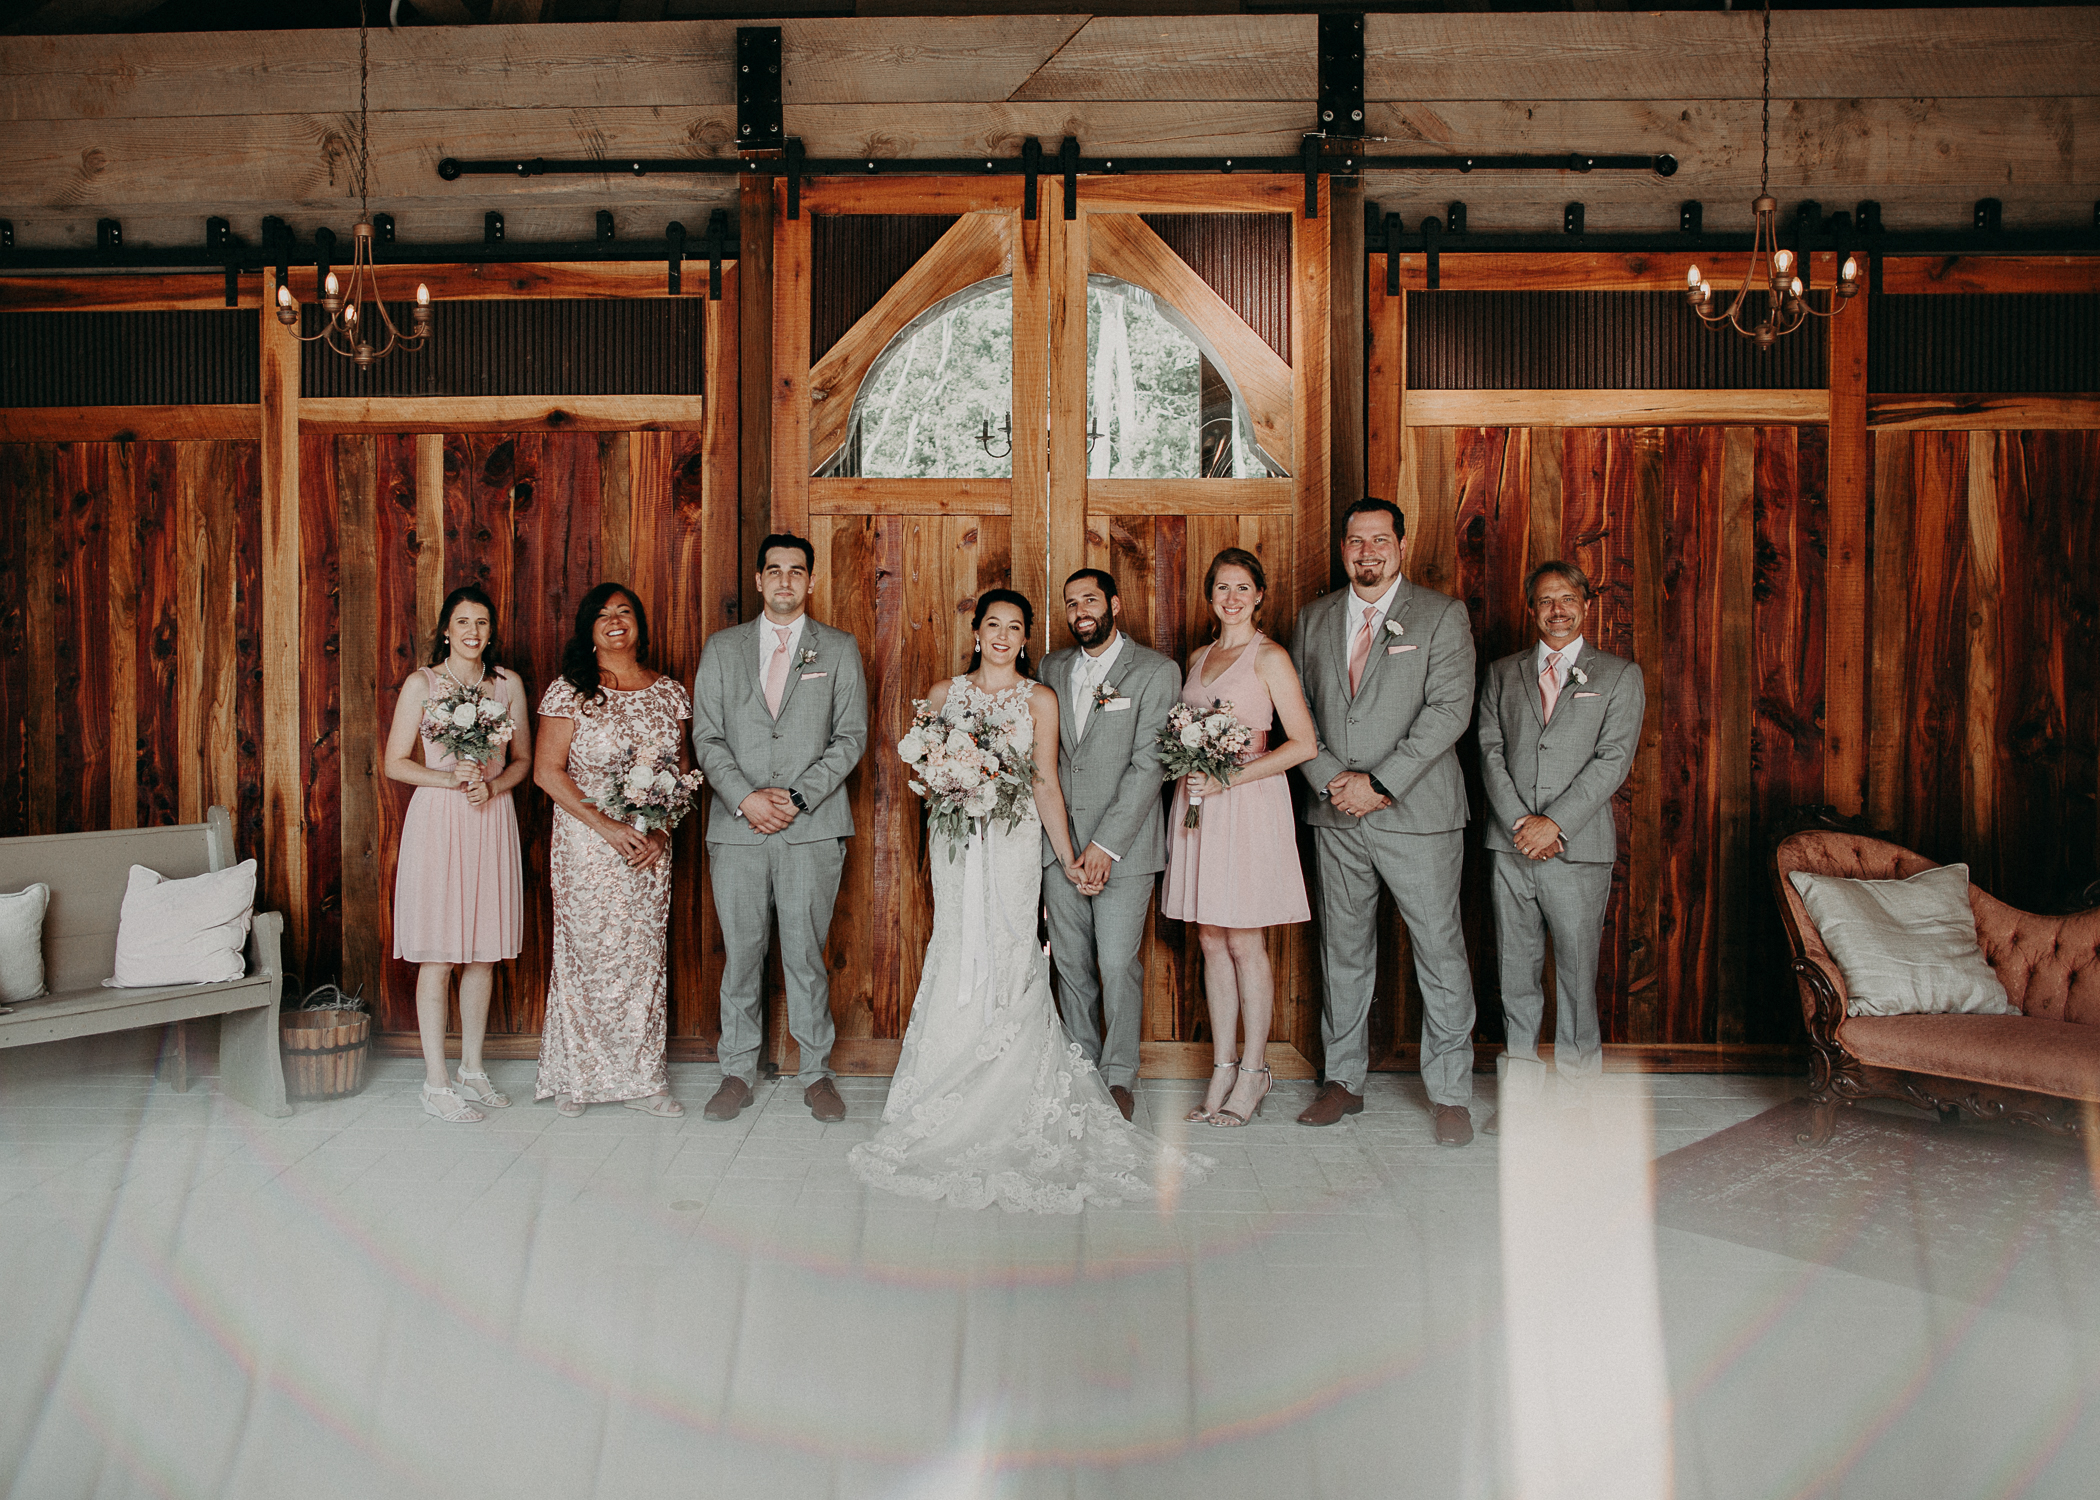 52 wedding day portraits bride and groom atlanta - georgia - ga wedding photographer .jpg